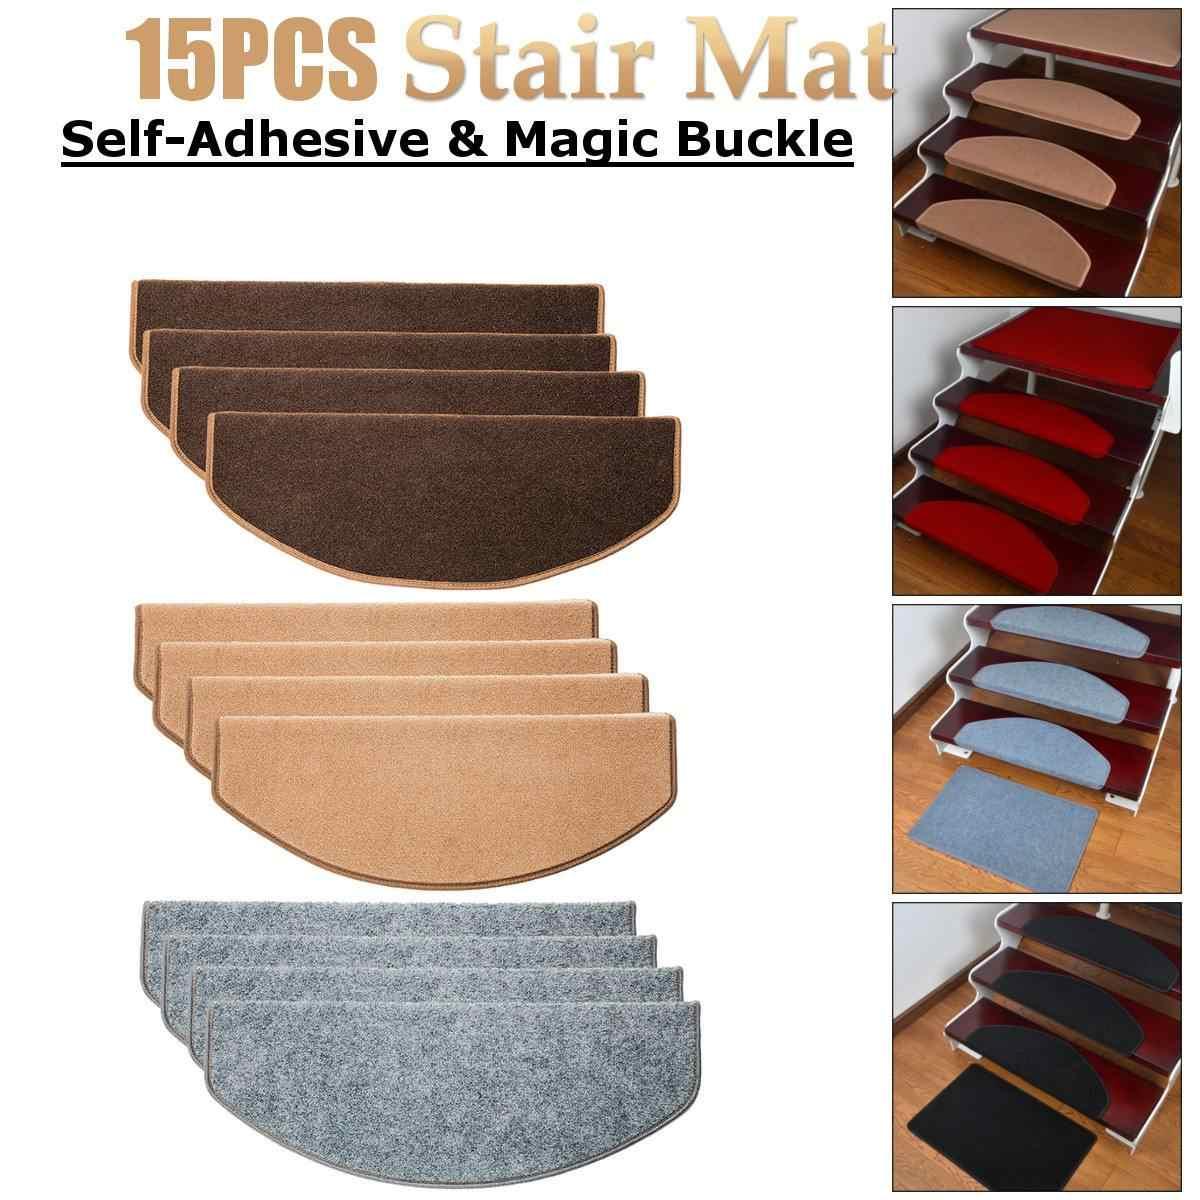 Image of: 15pcs Stair Tread Carpet Mats Self Adhesive Stair Mat Stair Mat Anti Skid Step Rugs Safety Mute Floor Mats Indoor Warm Pad 55×21 Mat Aliexpress